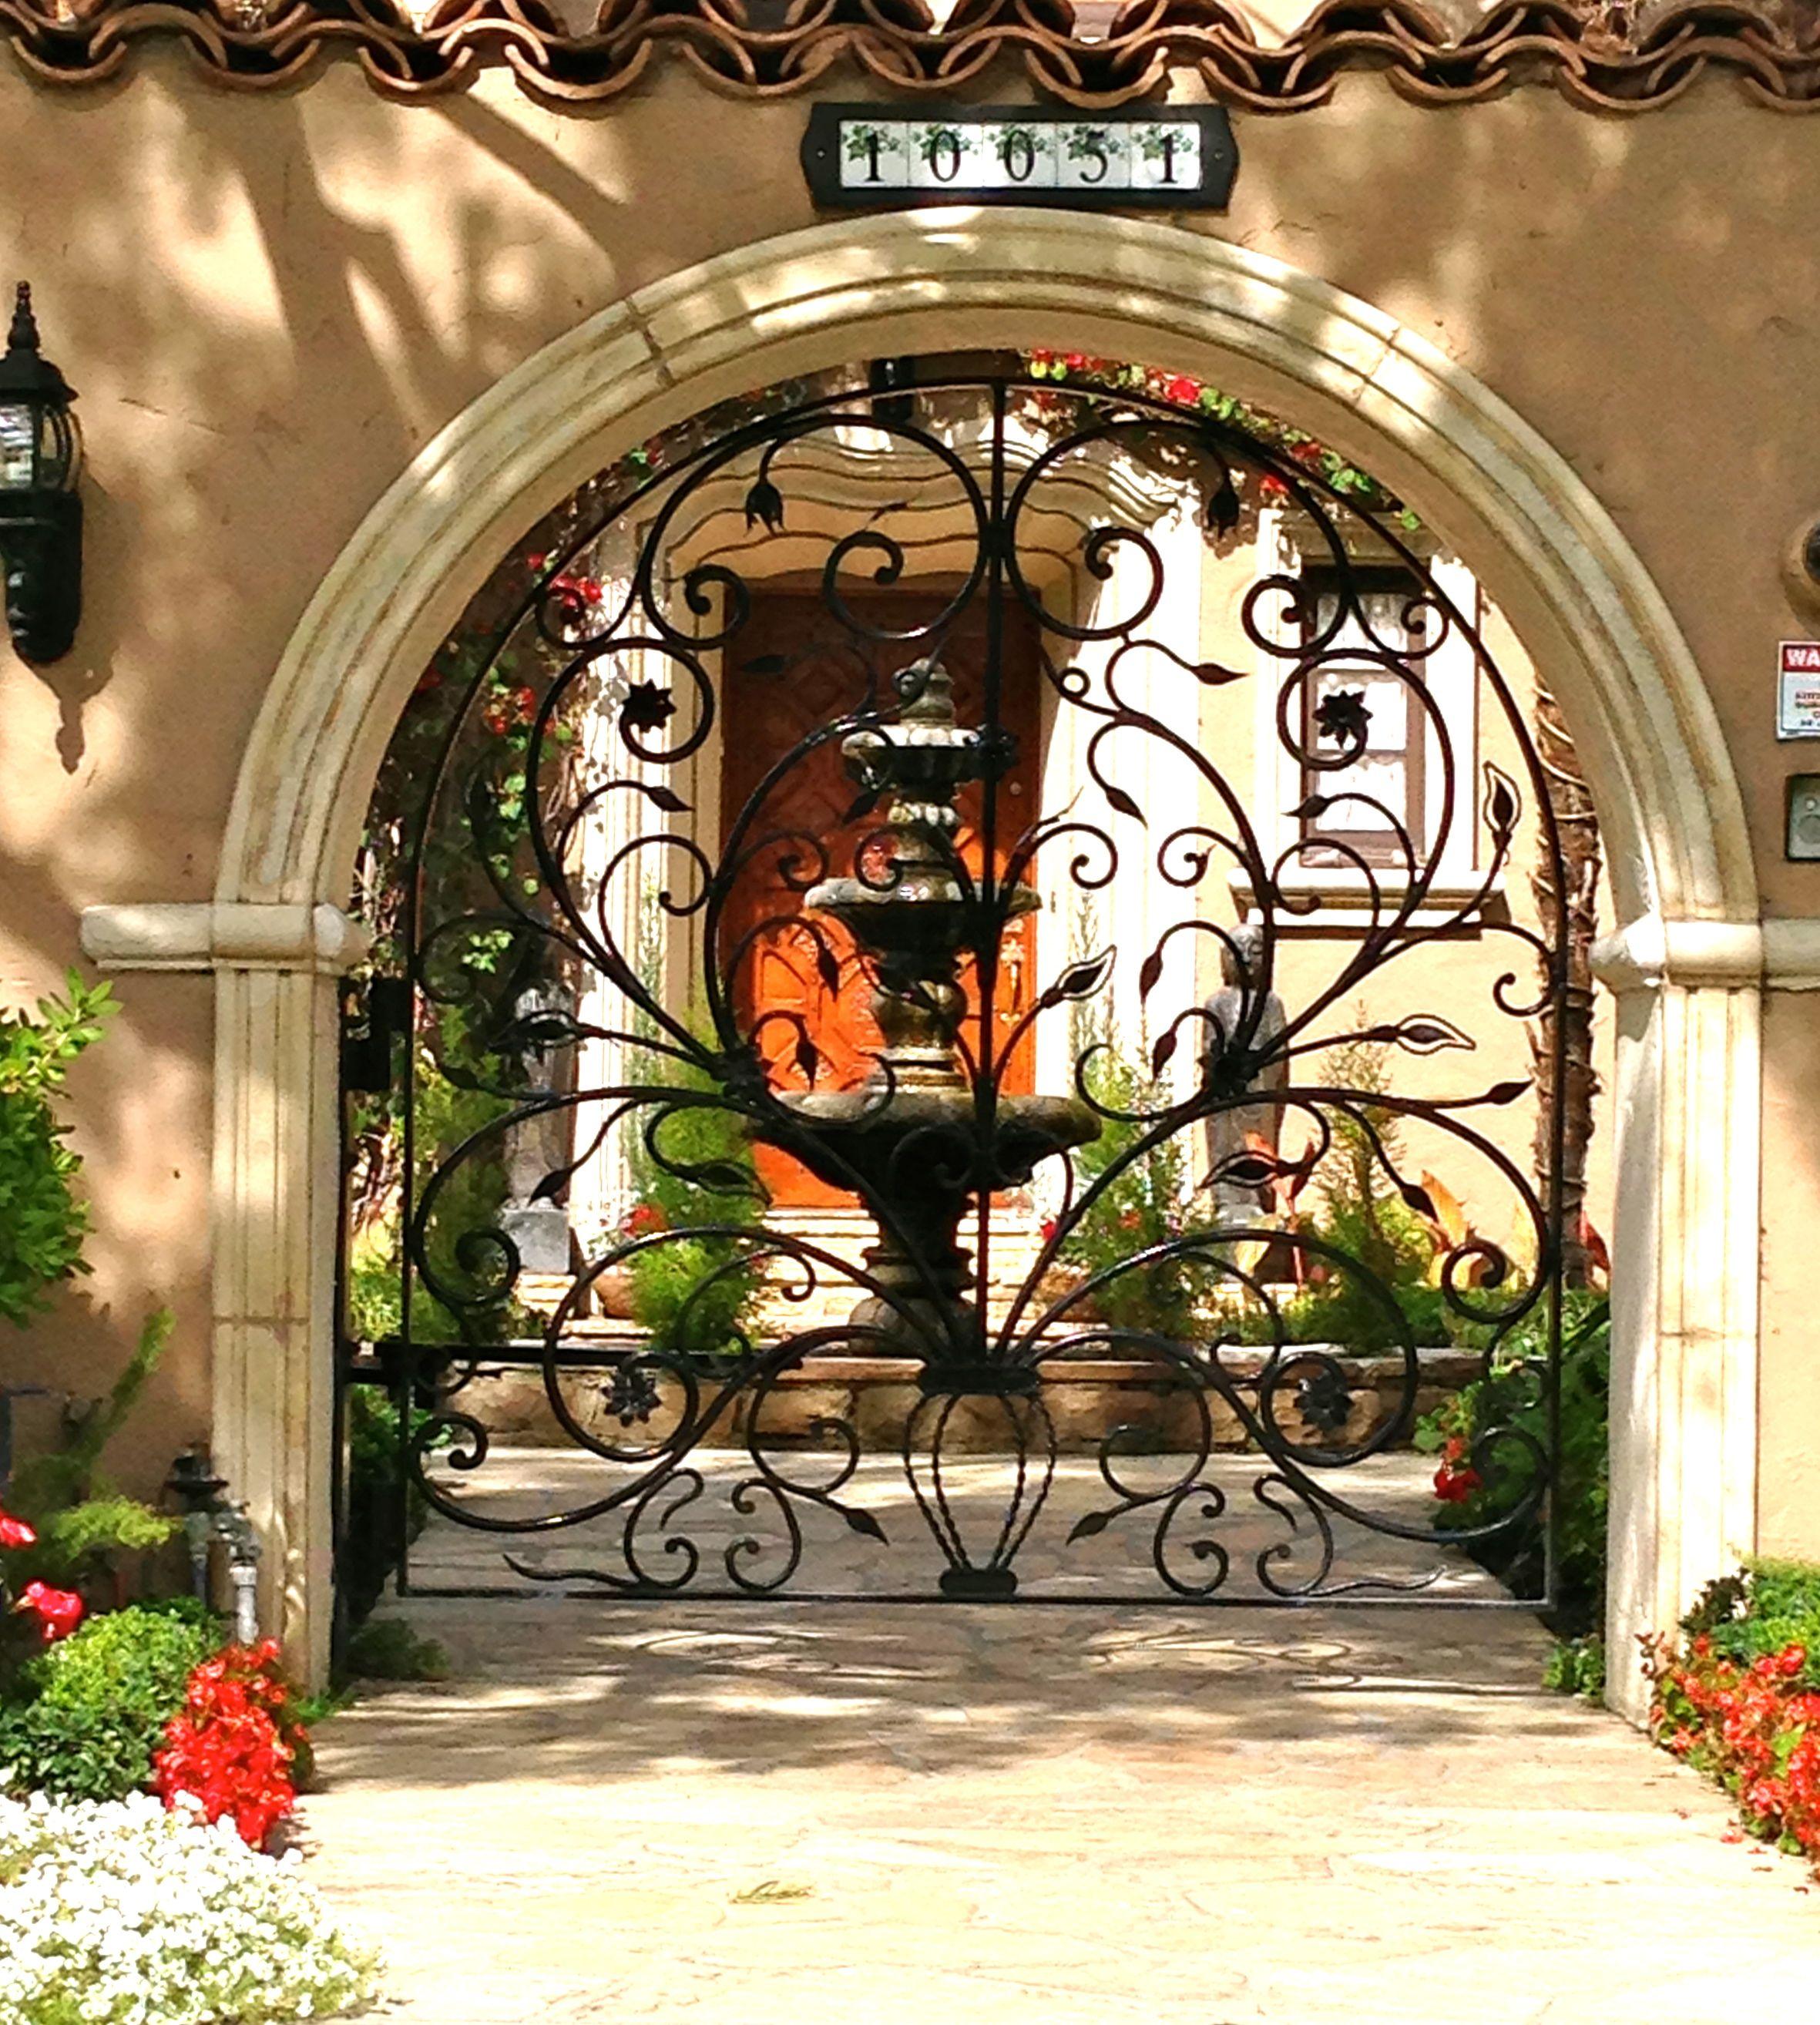 gorgeous entry on a spanish style home idg gateway gates fences pinterest tropische. Black Bedroom Furniture Sets. Home Design Ideas